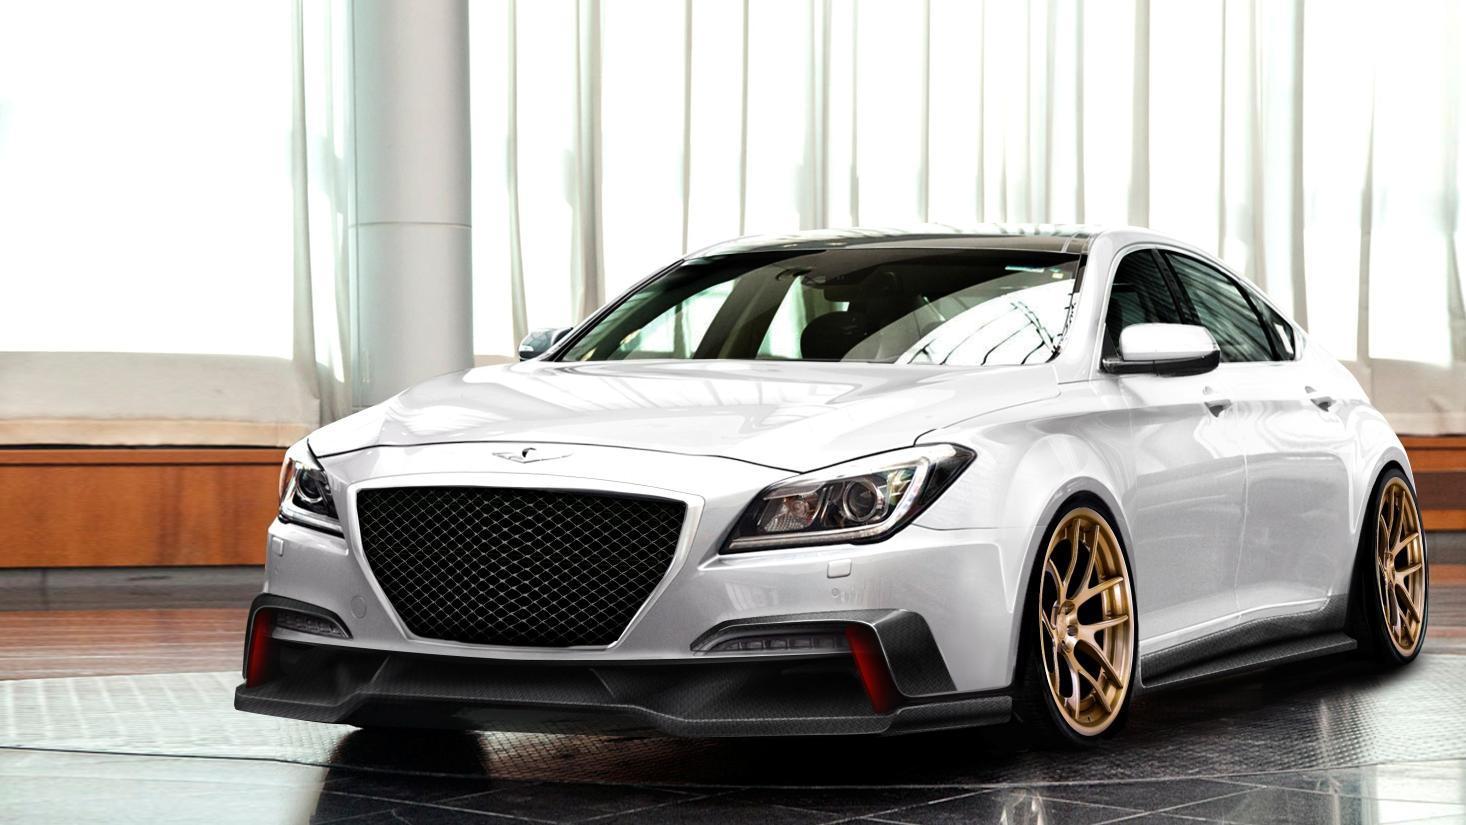 2015 Hyundai Genesis by ARK Performance, 2014 SEMA